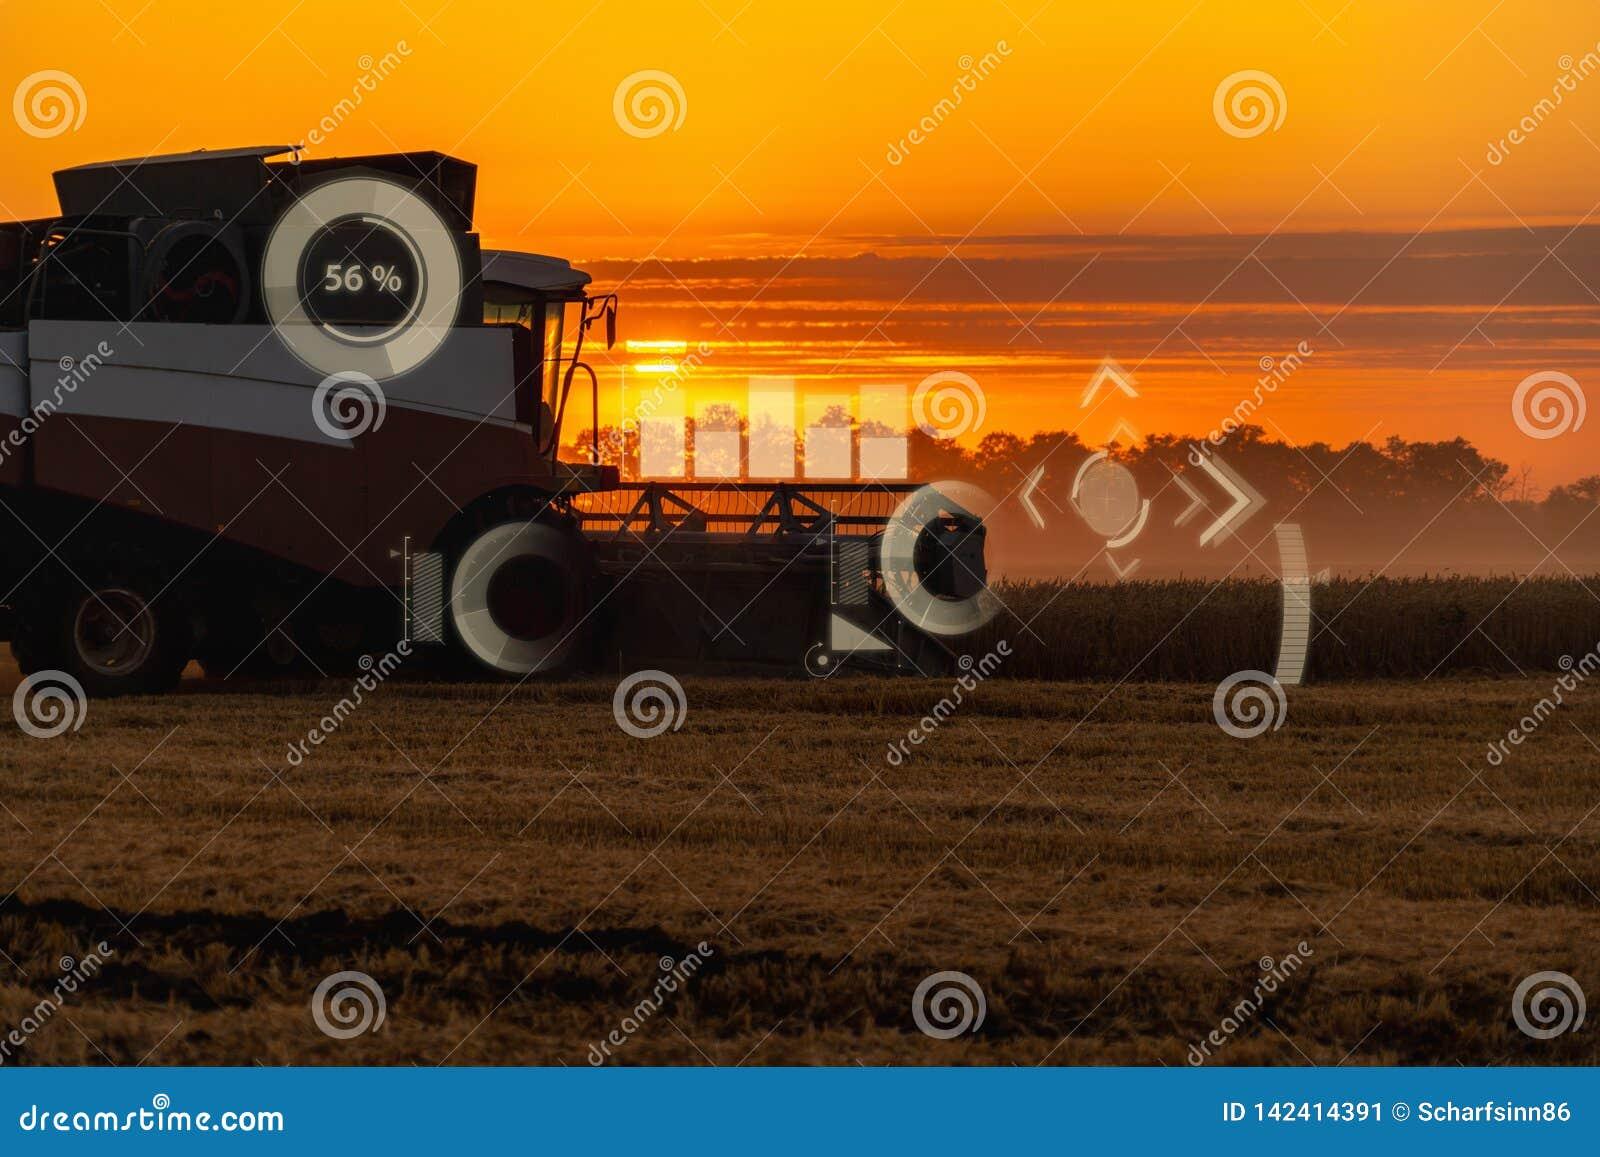 A modern combine harvester stock image  Image of harvesting - 142414391